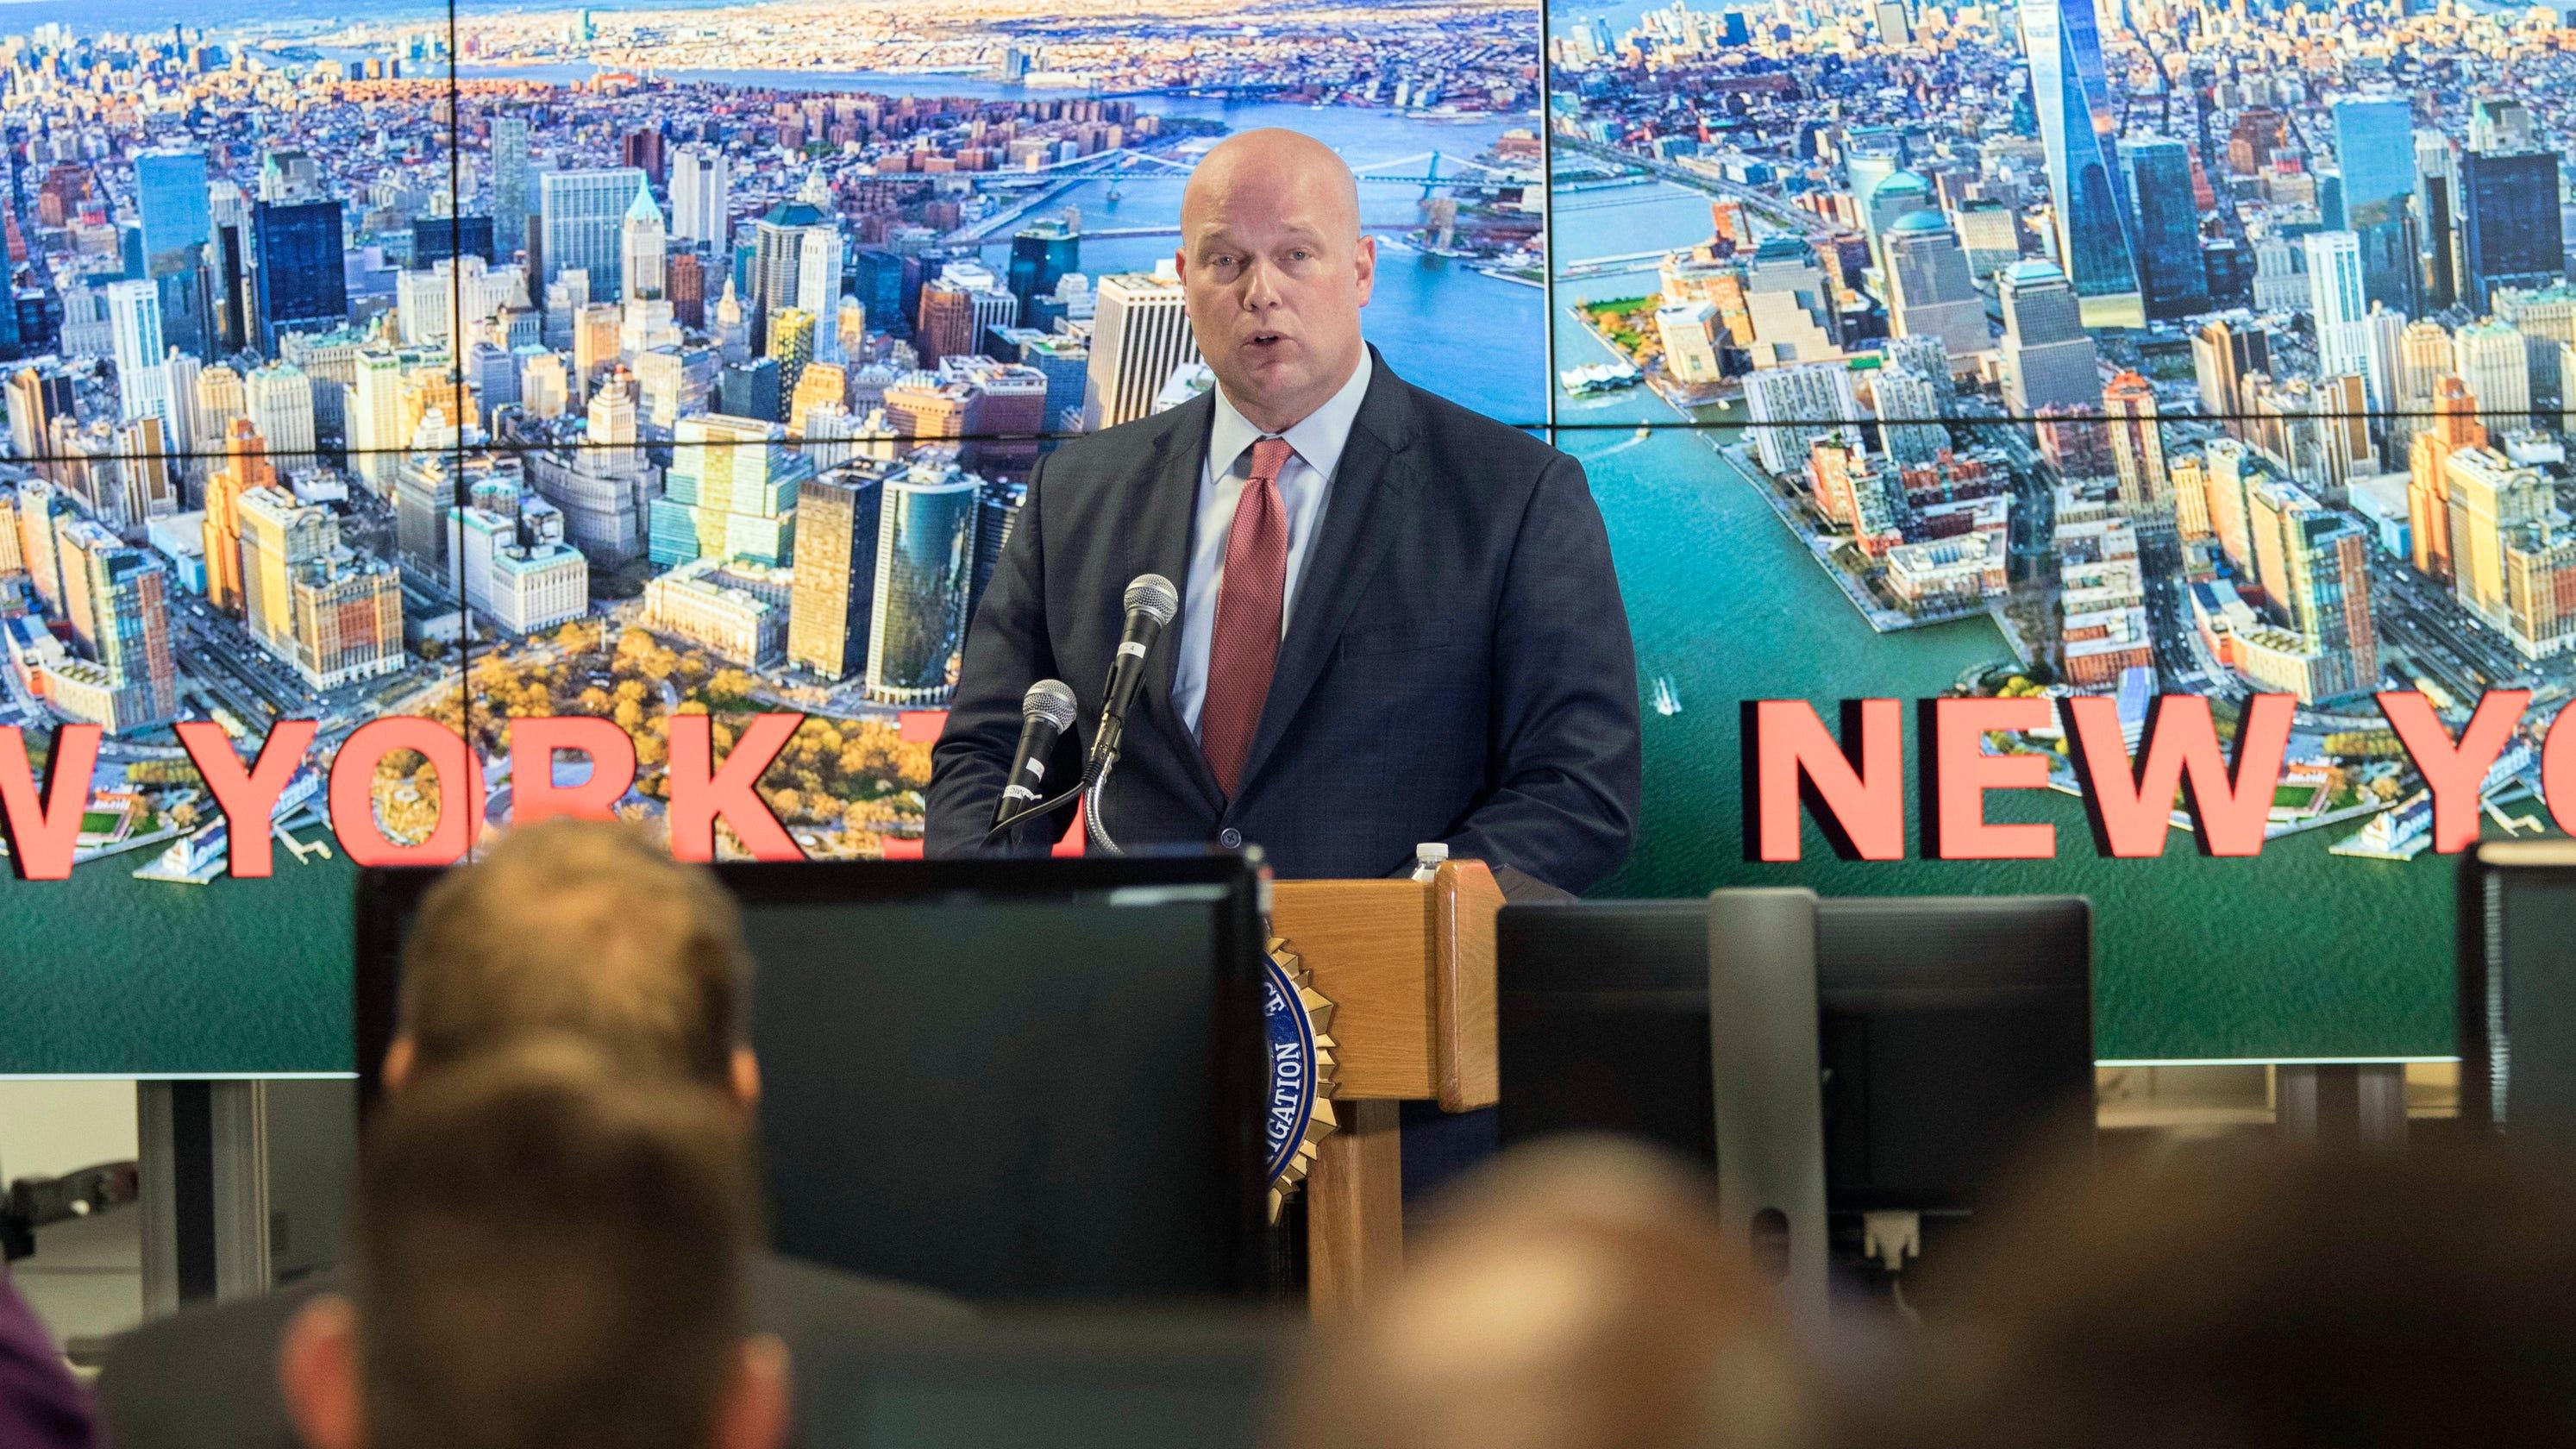 Acting U S  Attorney General erroneously says NY/NJ bomber